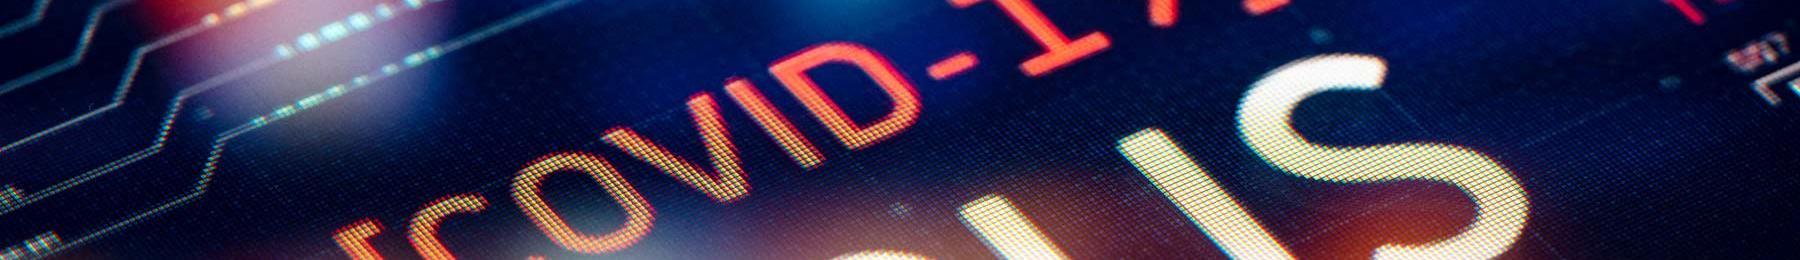 digital screen displaying COVID-19